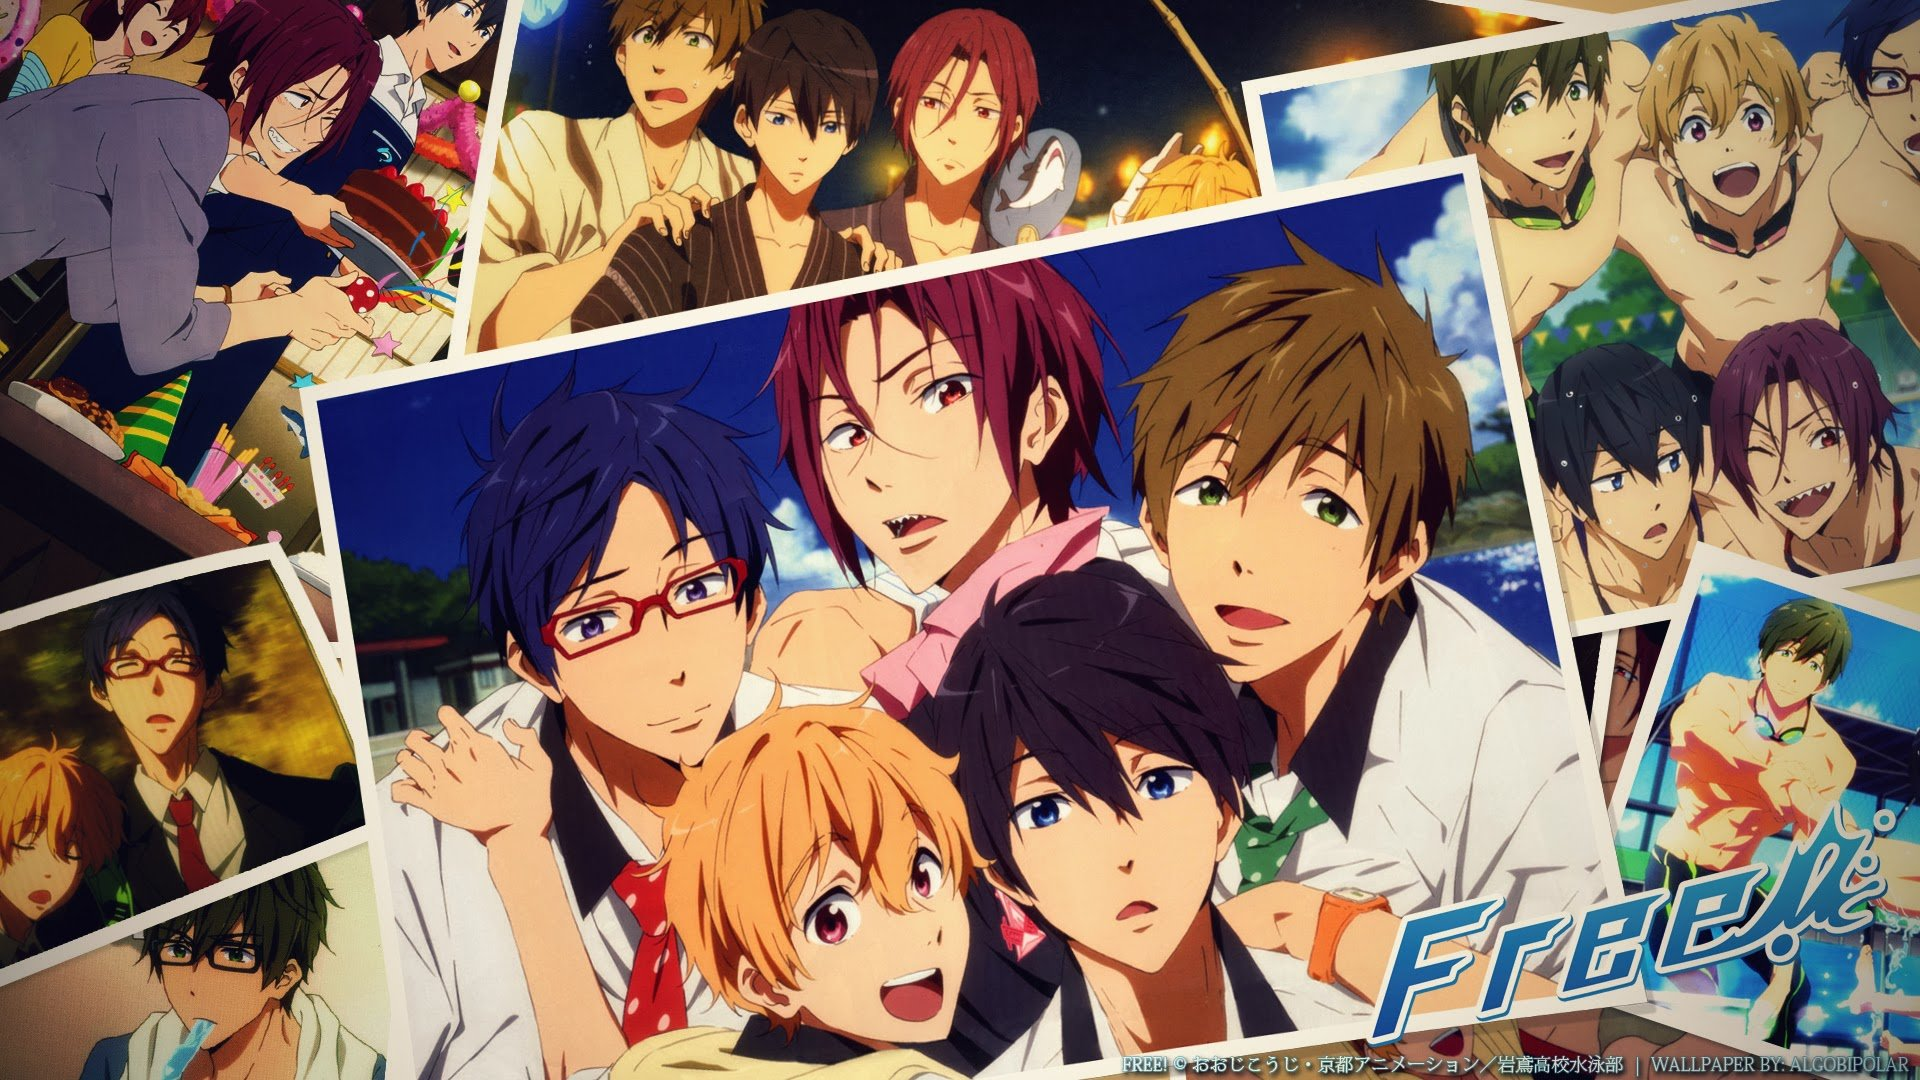 Free Iwatobi Swim Club Wallpapers Hd For Desktop Backgrounds